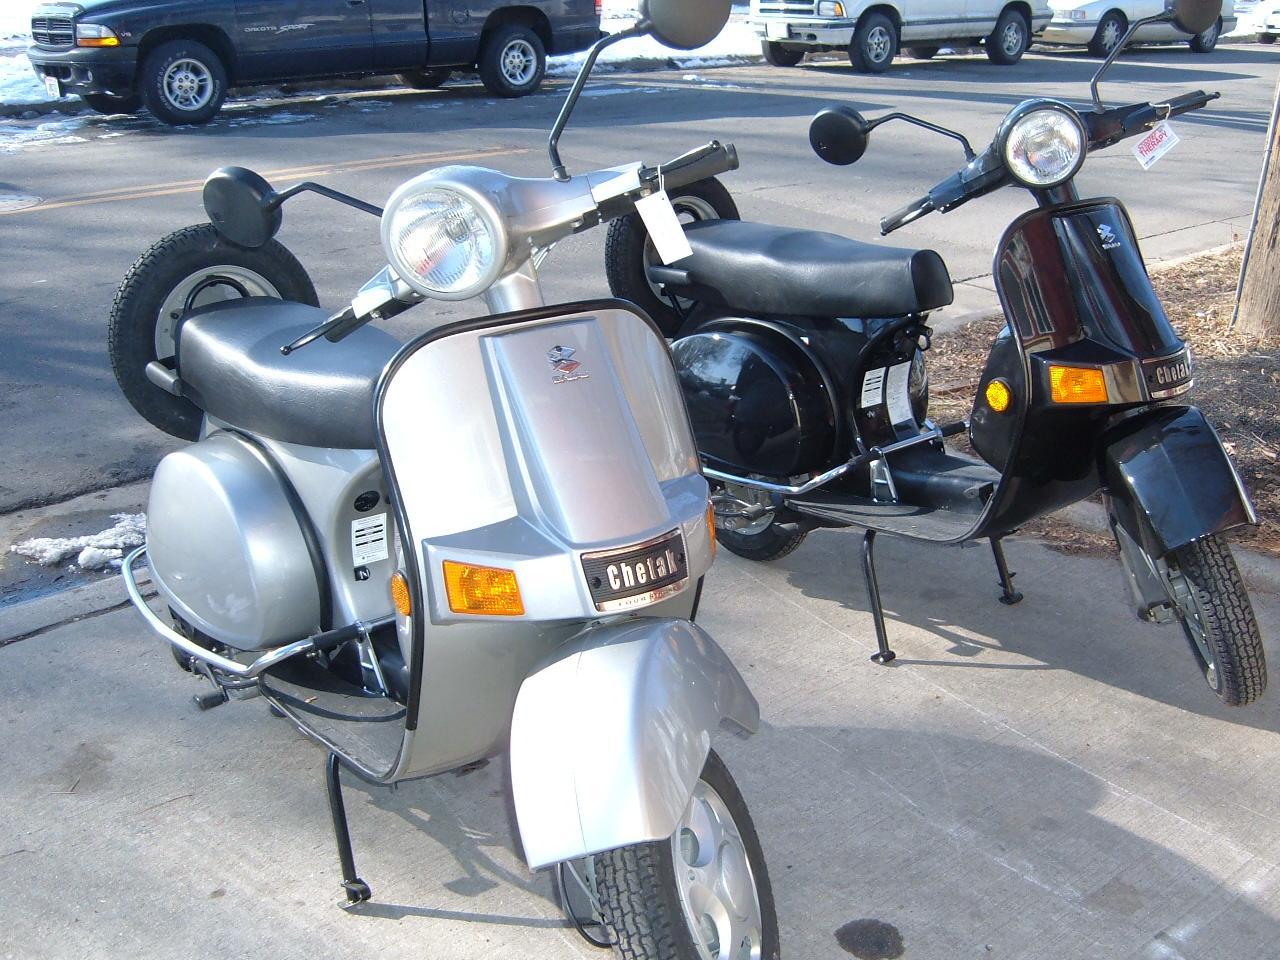 2006 model